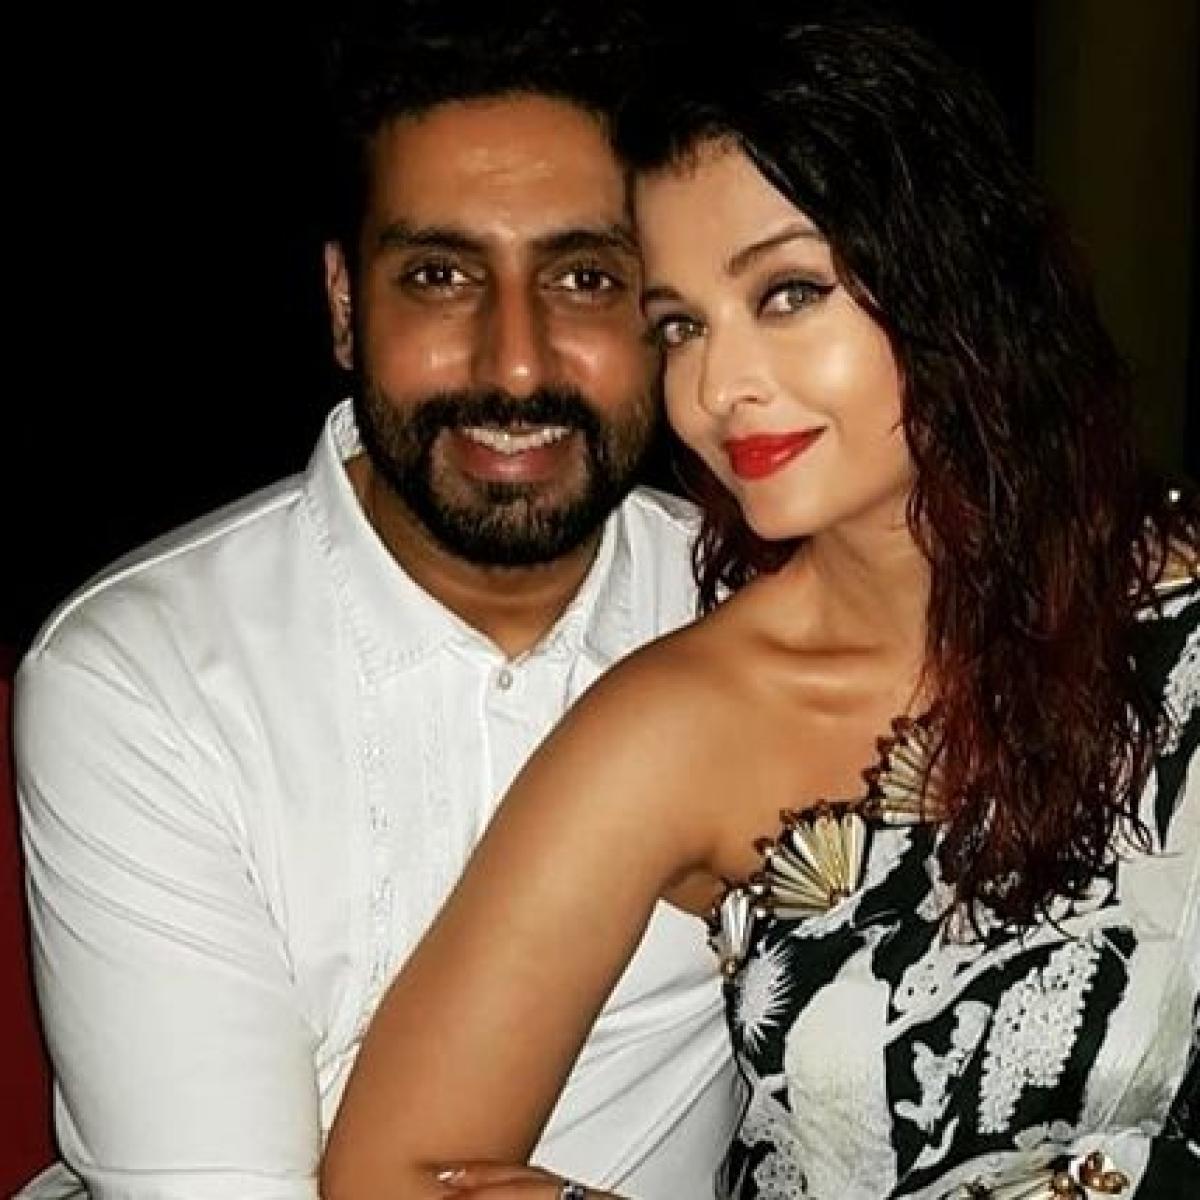 'Can't believe it's been 14 years': Tina Ambani wishes Aishwarya Rai, Abhishek Bachchan on their wedding anniversary